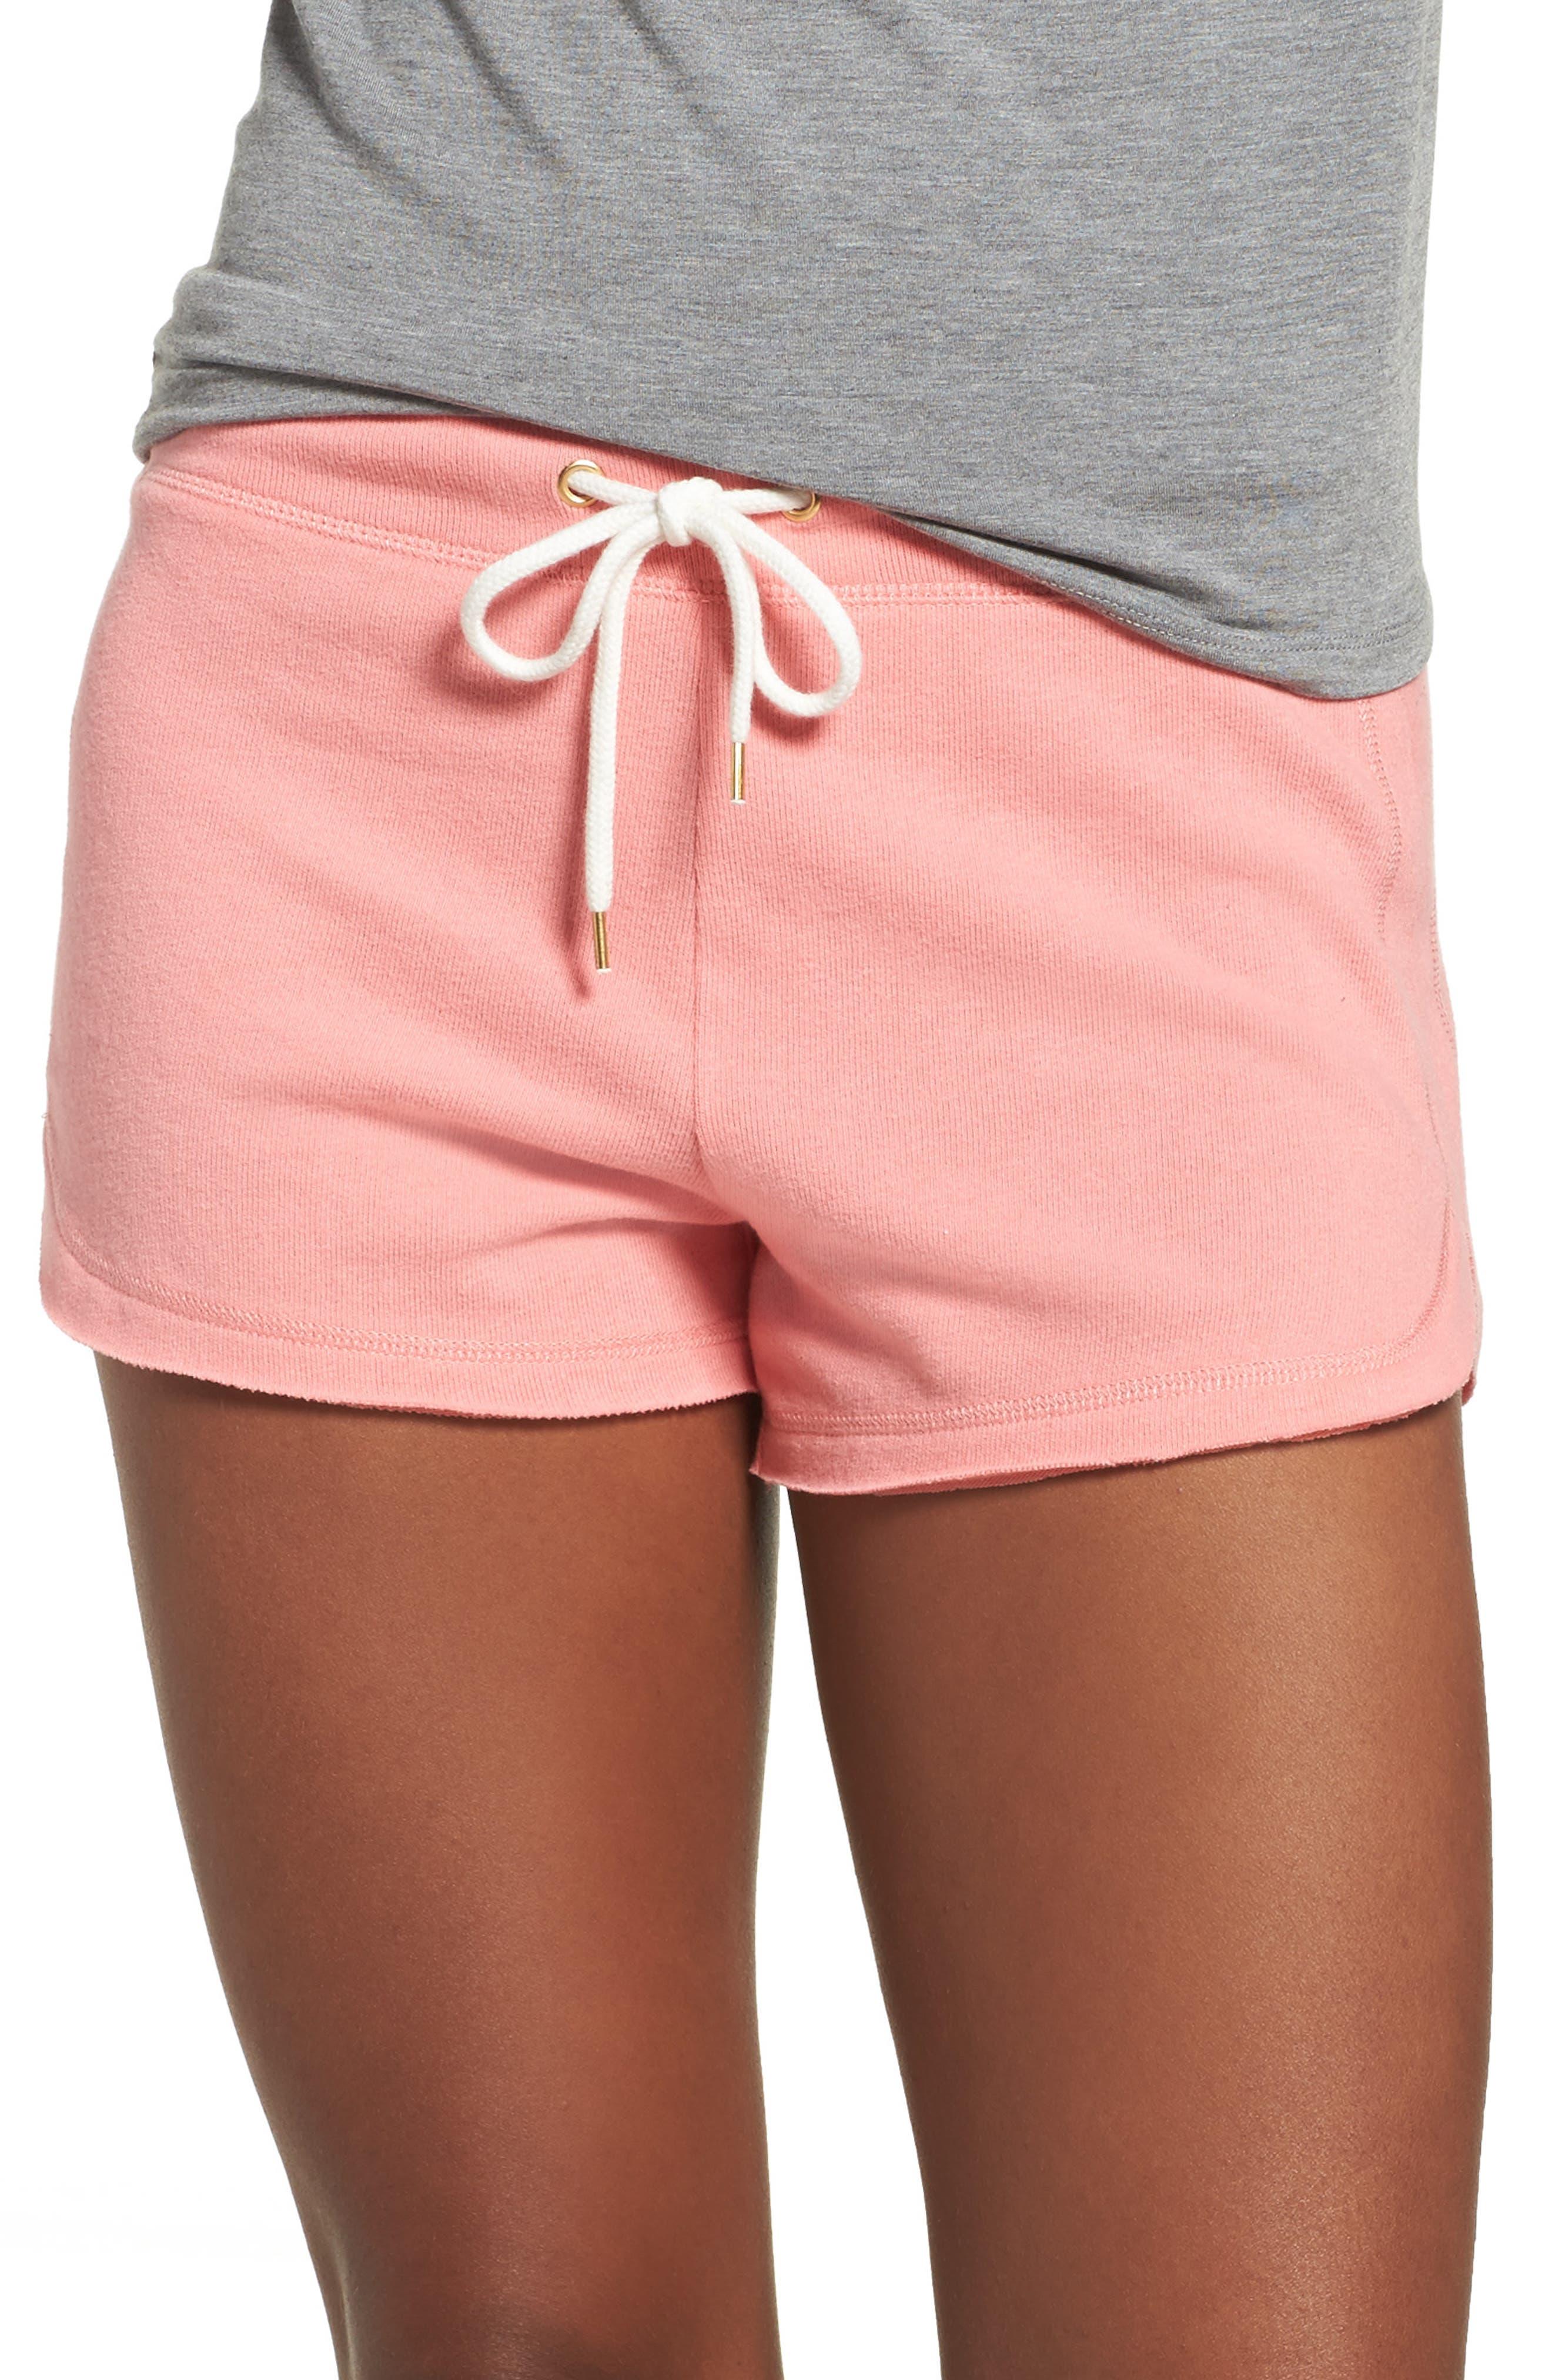 Honeydew Hacci Lounge Shorts